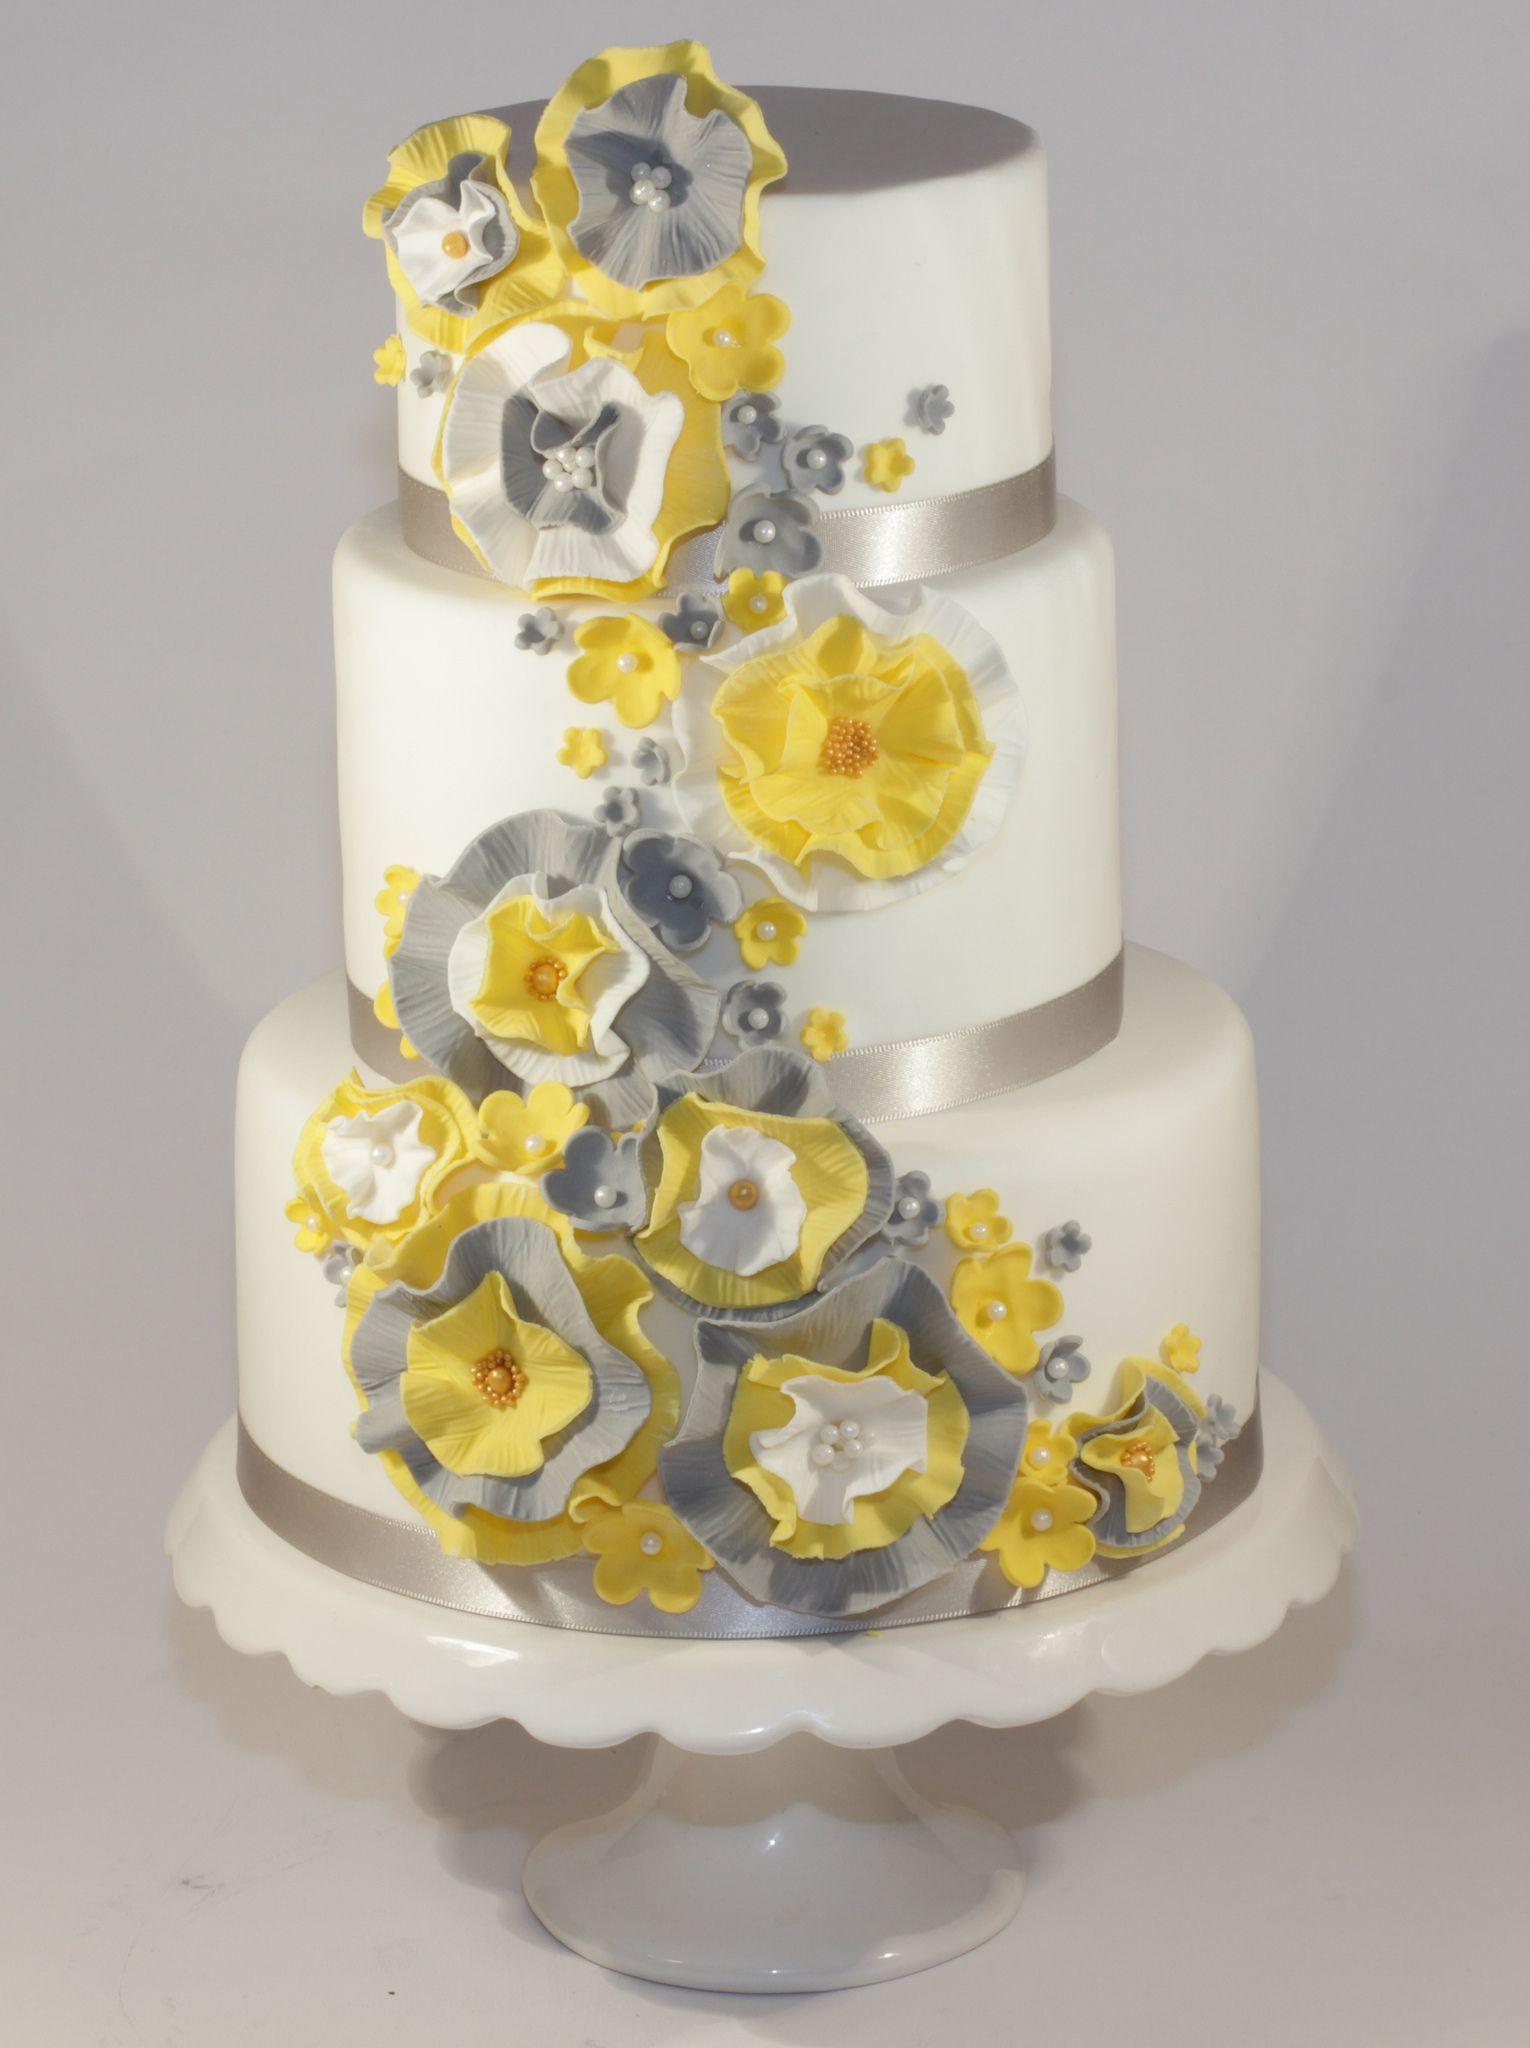 Wedding decorations yellow and gray  yellow u grey ruffle wedding cake  Wedding Cakes  Pinterest